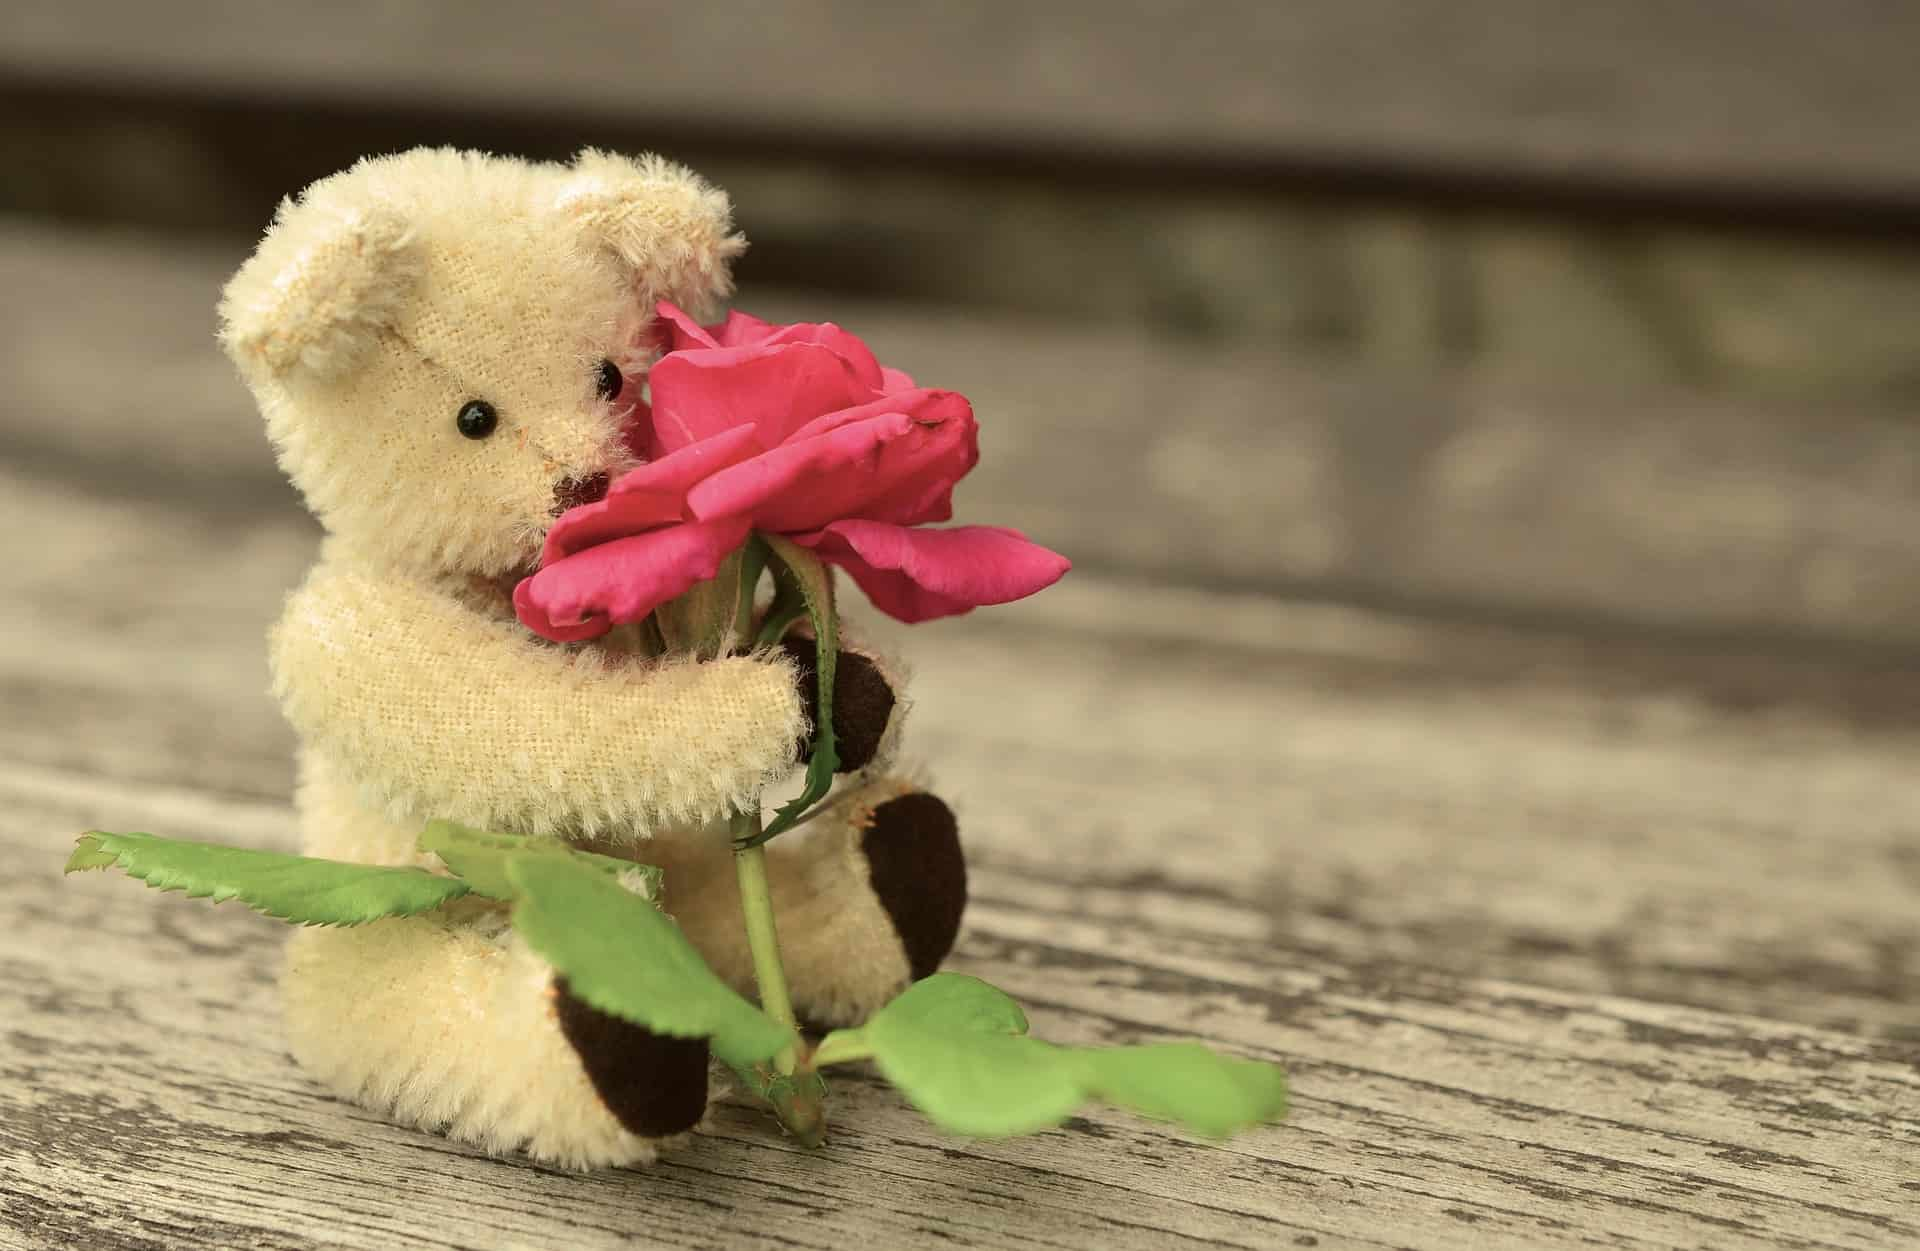 Teddy 889892 1920